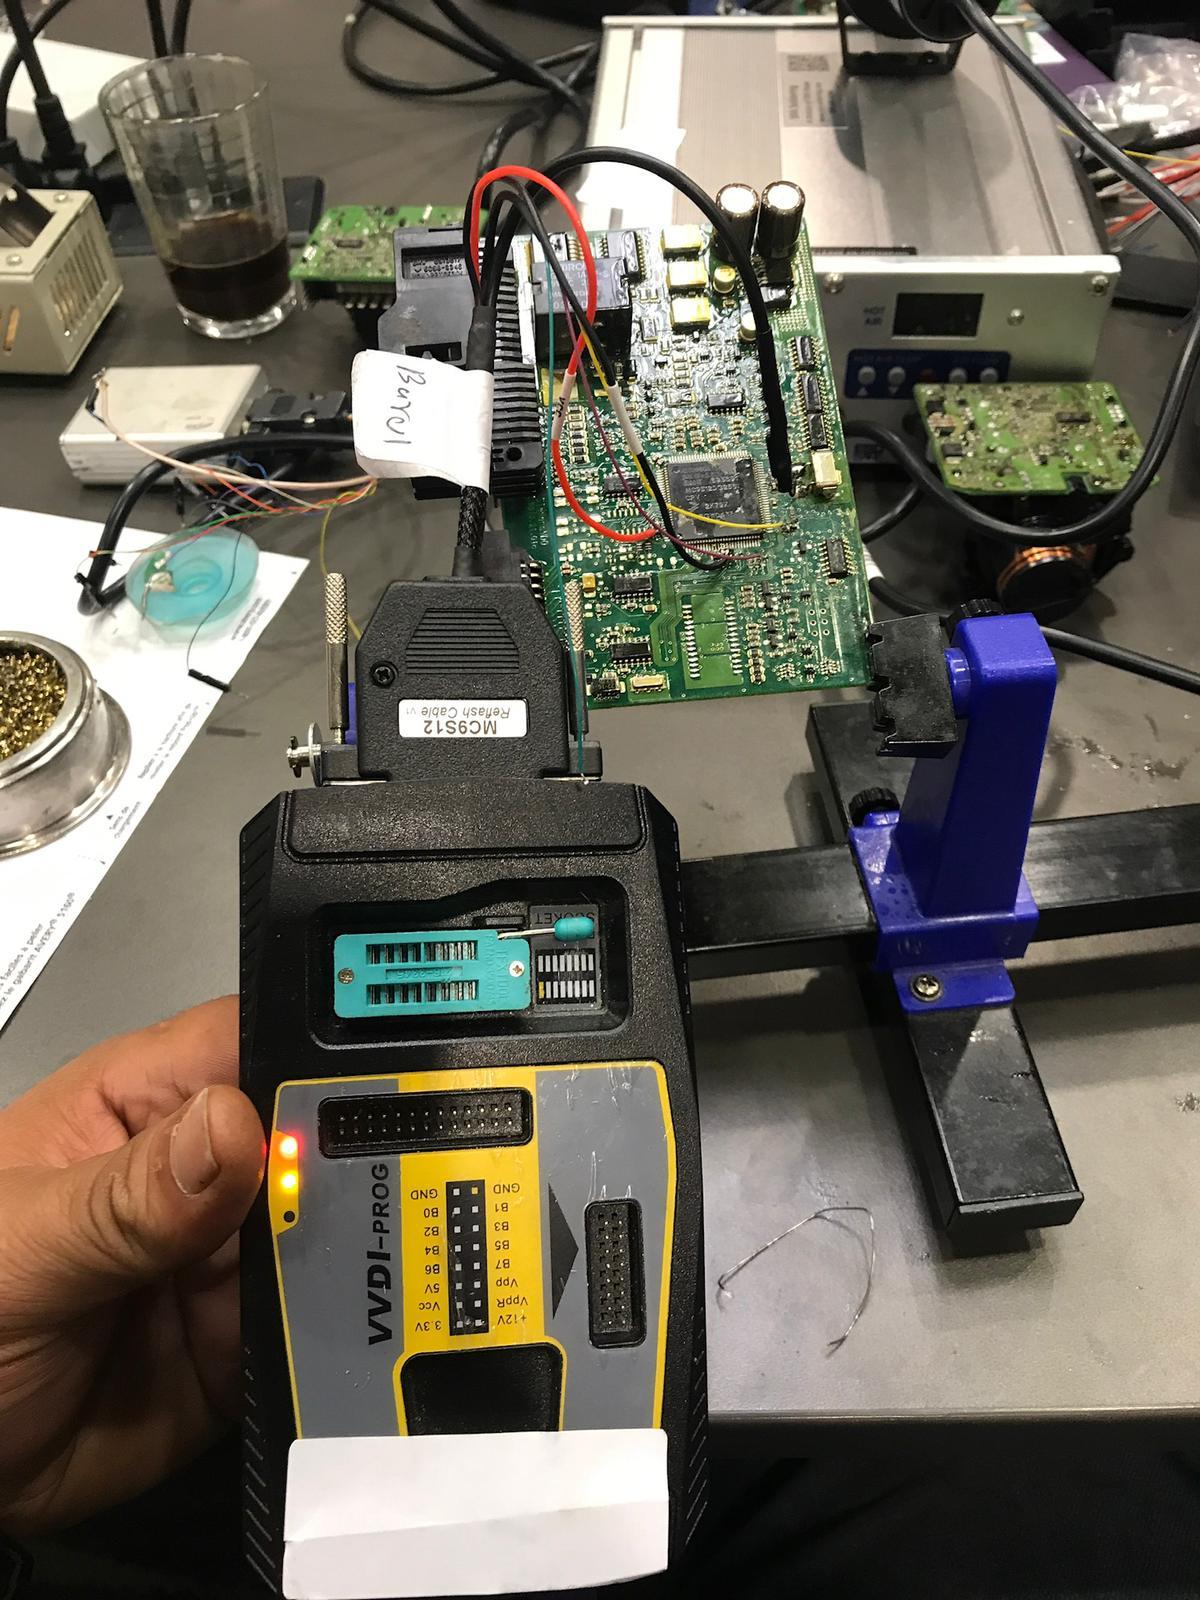 The EEPROM method- An alternative form of Key Making